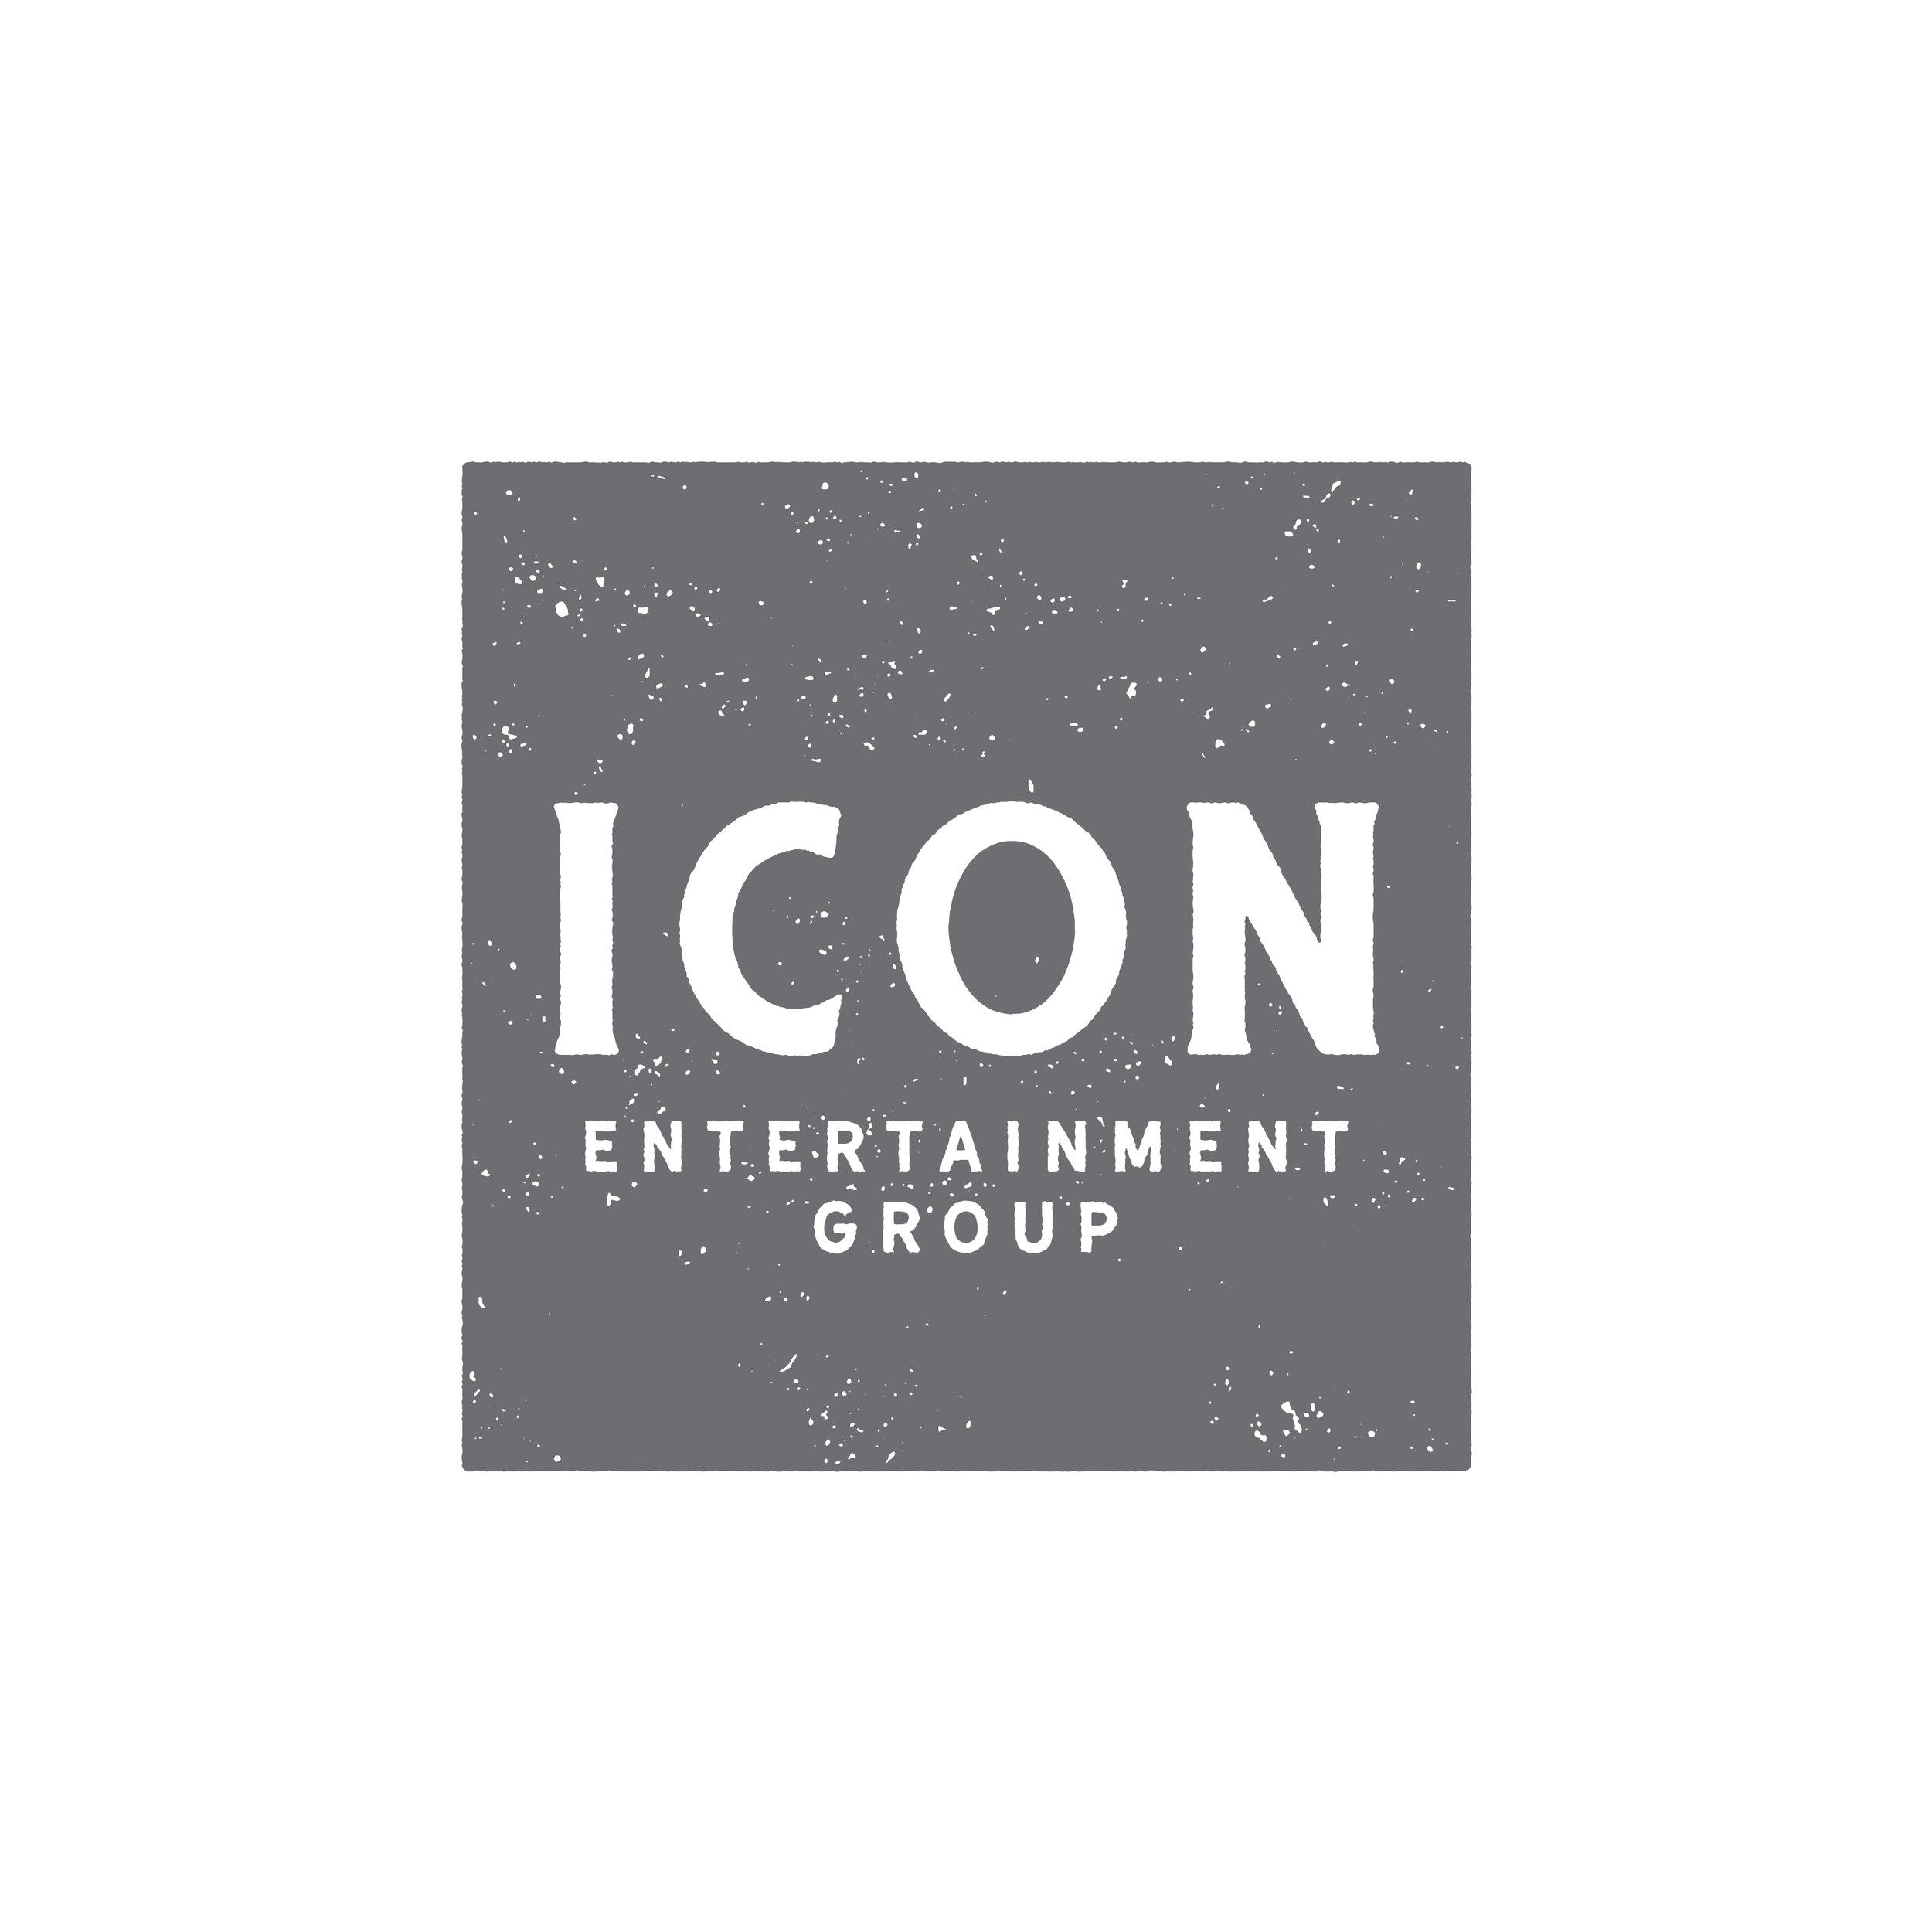 IconEnt-01.jpg